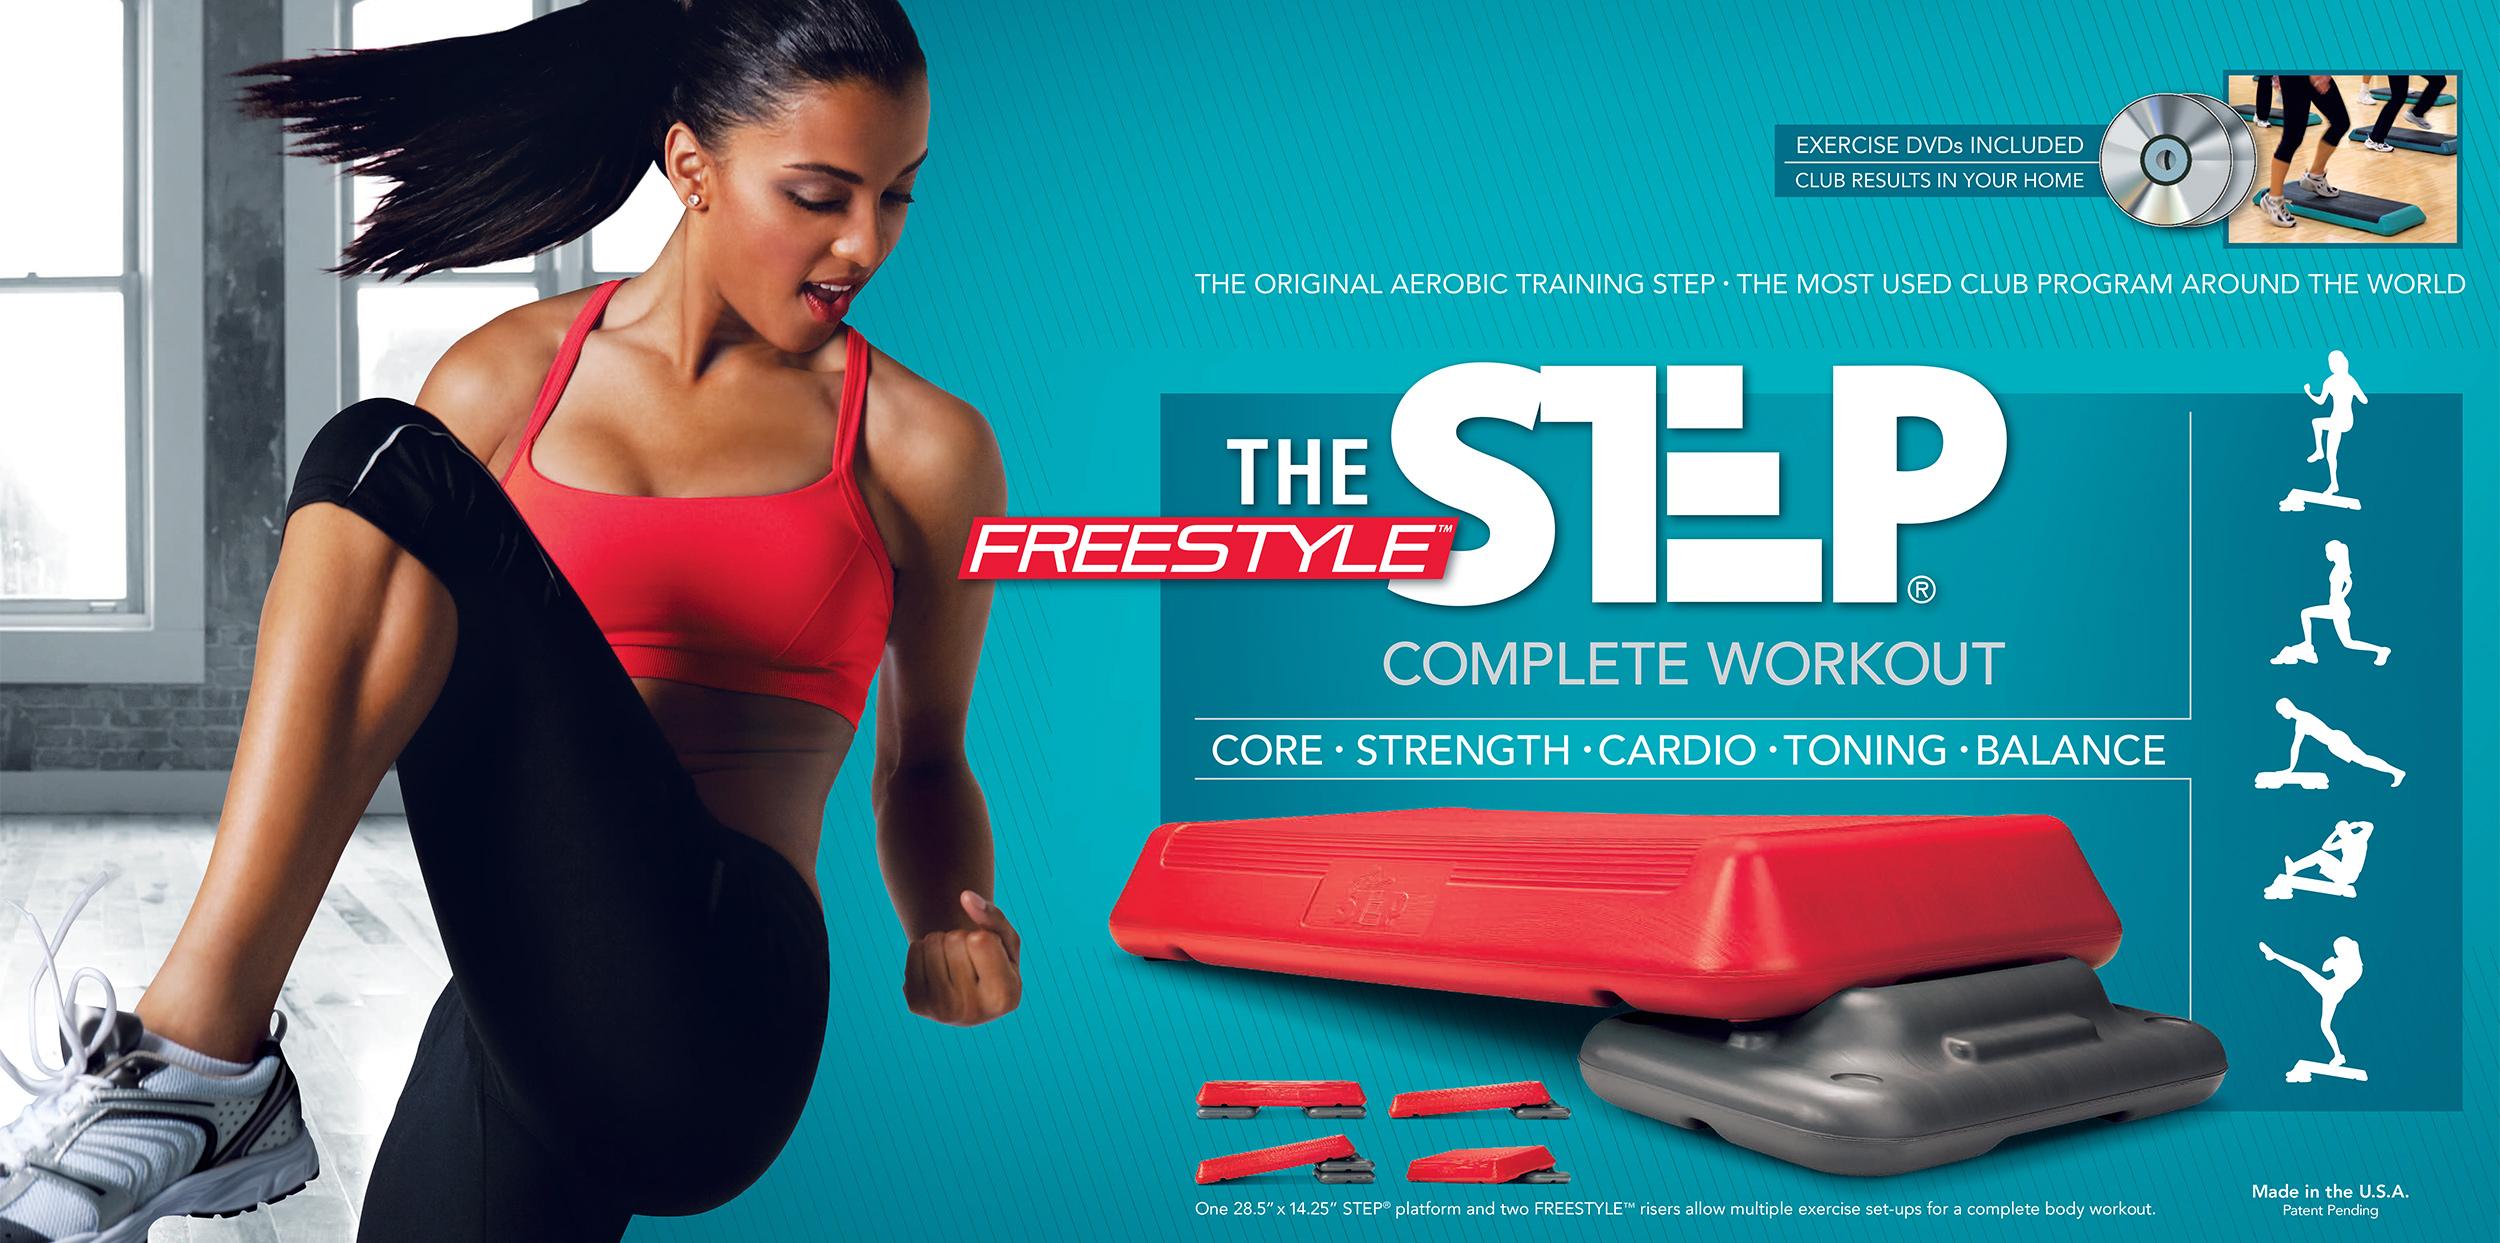 FreestyleStepPkg-1.jpg